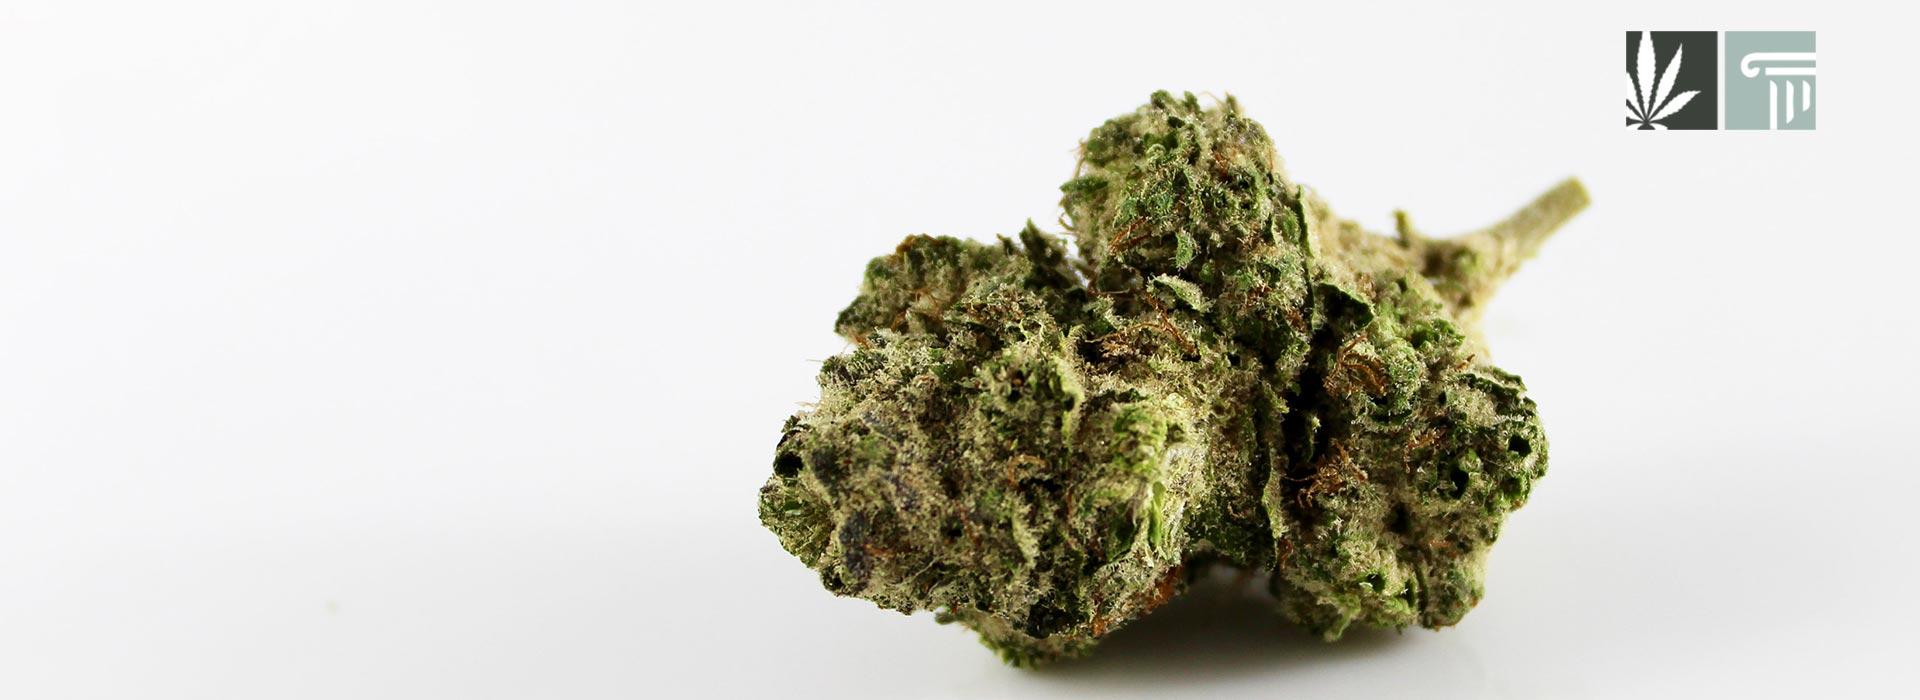 north carolina legalize medical marijuana